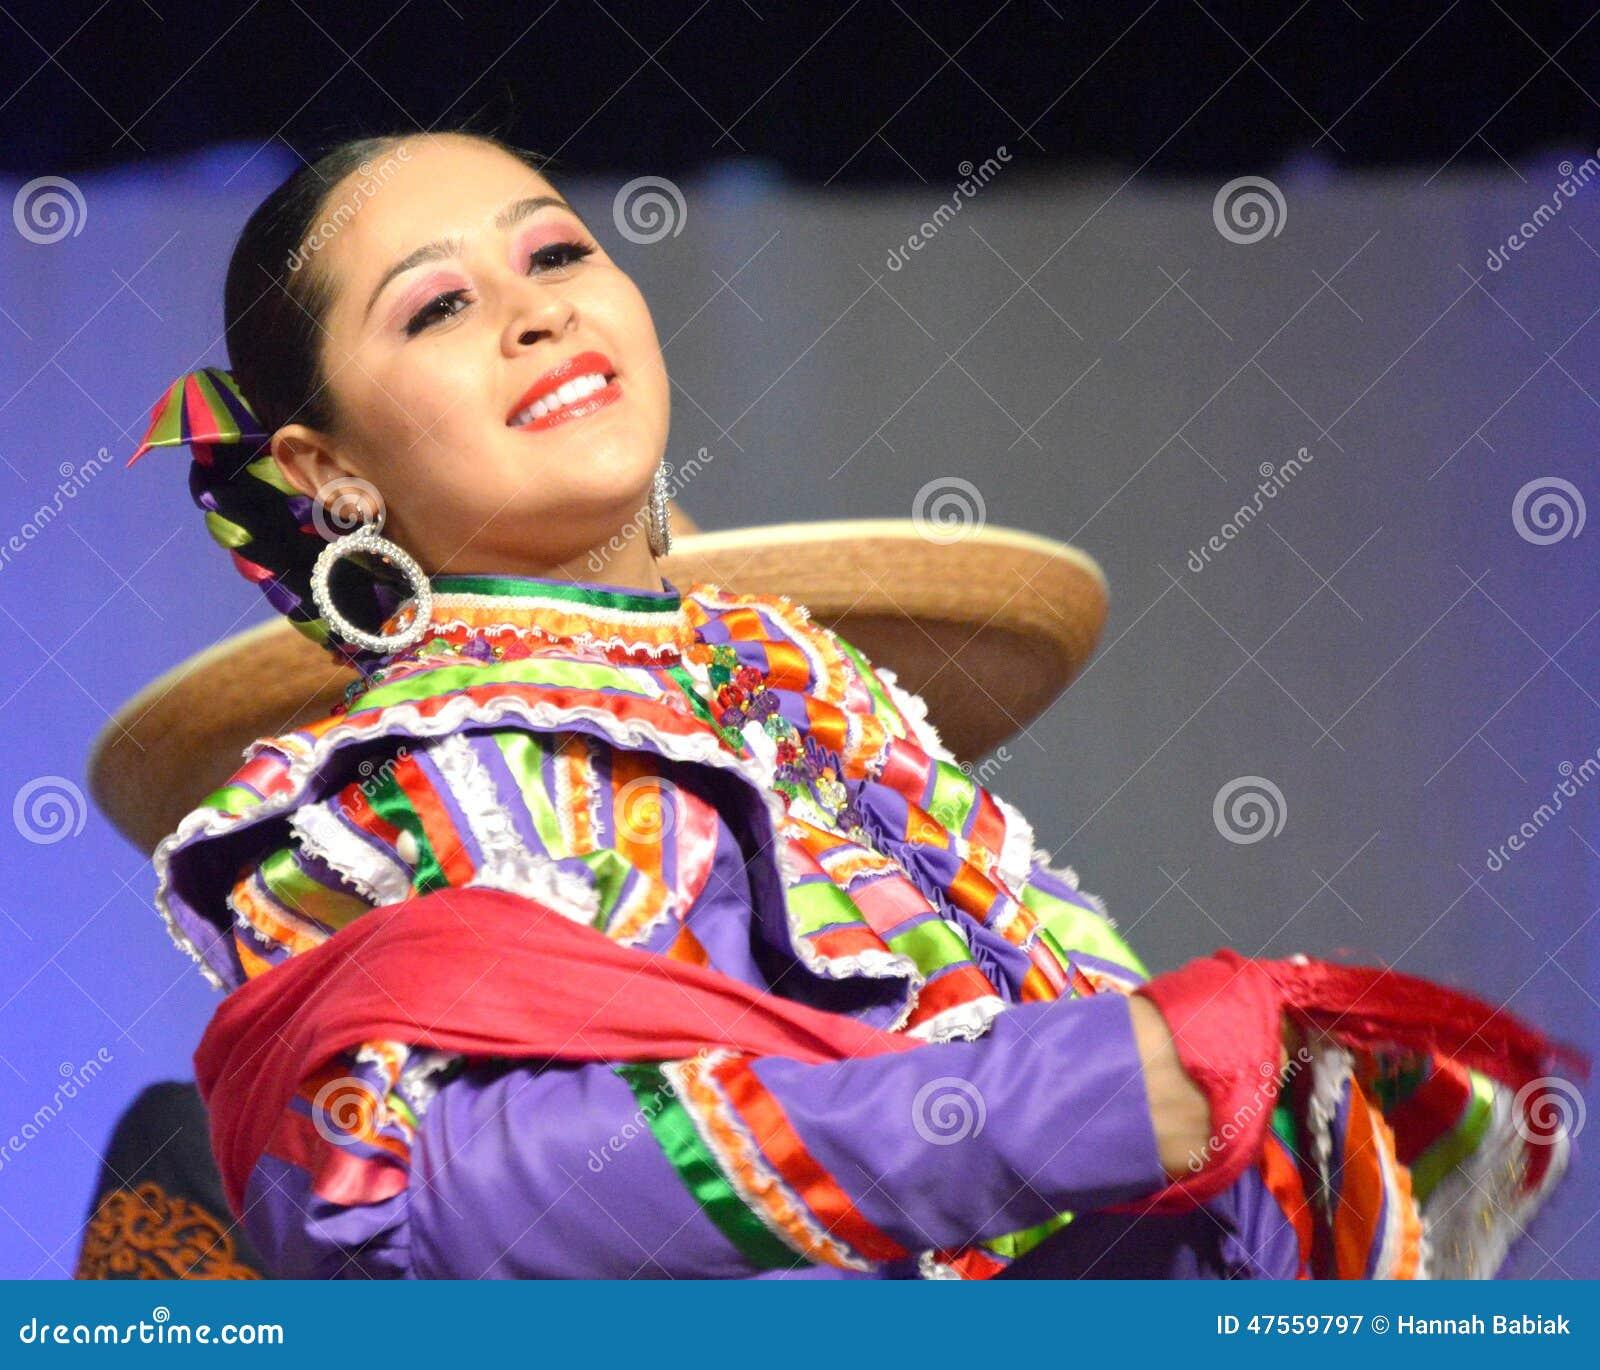 Female Mexican Dancer